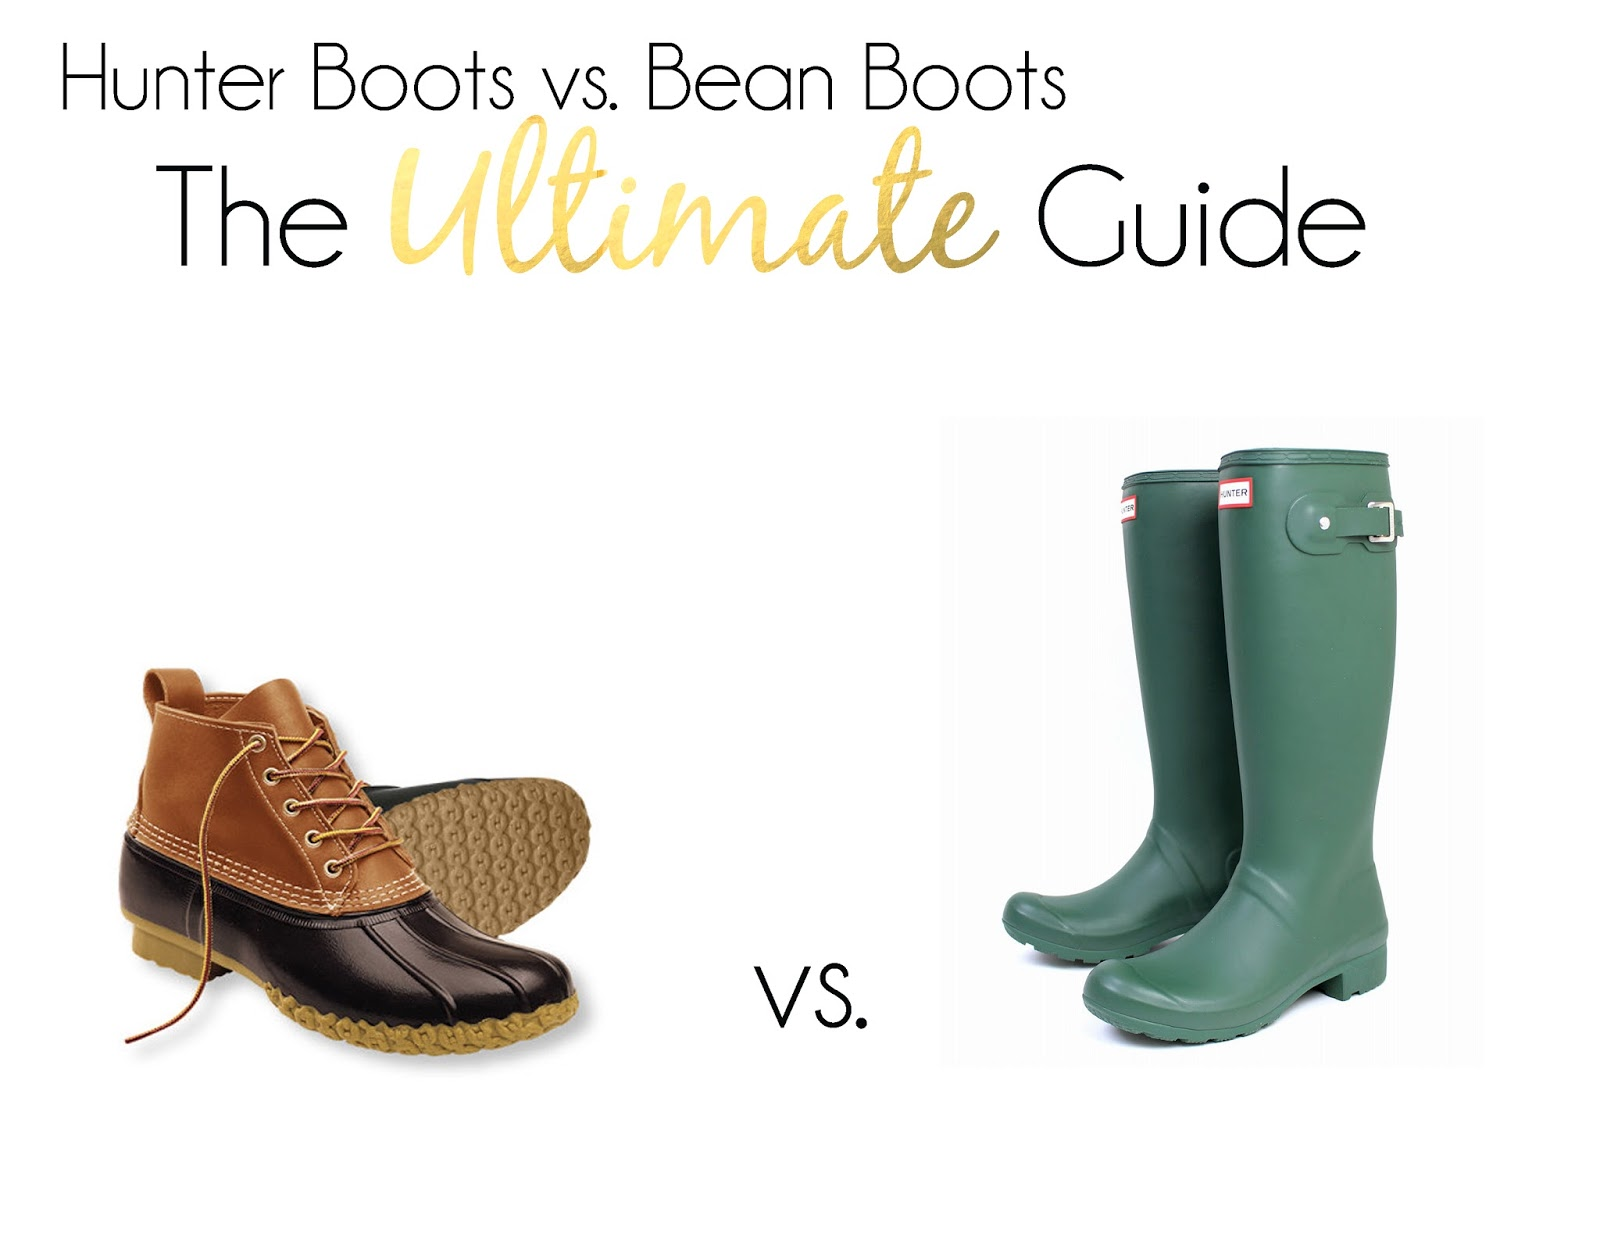 b76f0bae6e8c L.L. Bean Boots vs. Hunter Boots  The Ultimate Guide - PrepEssentials